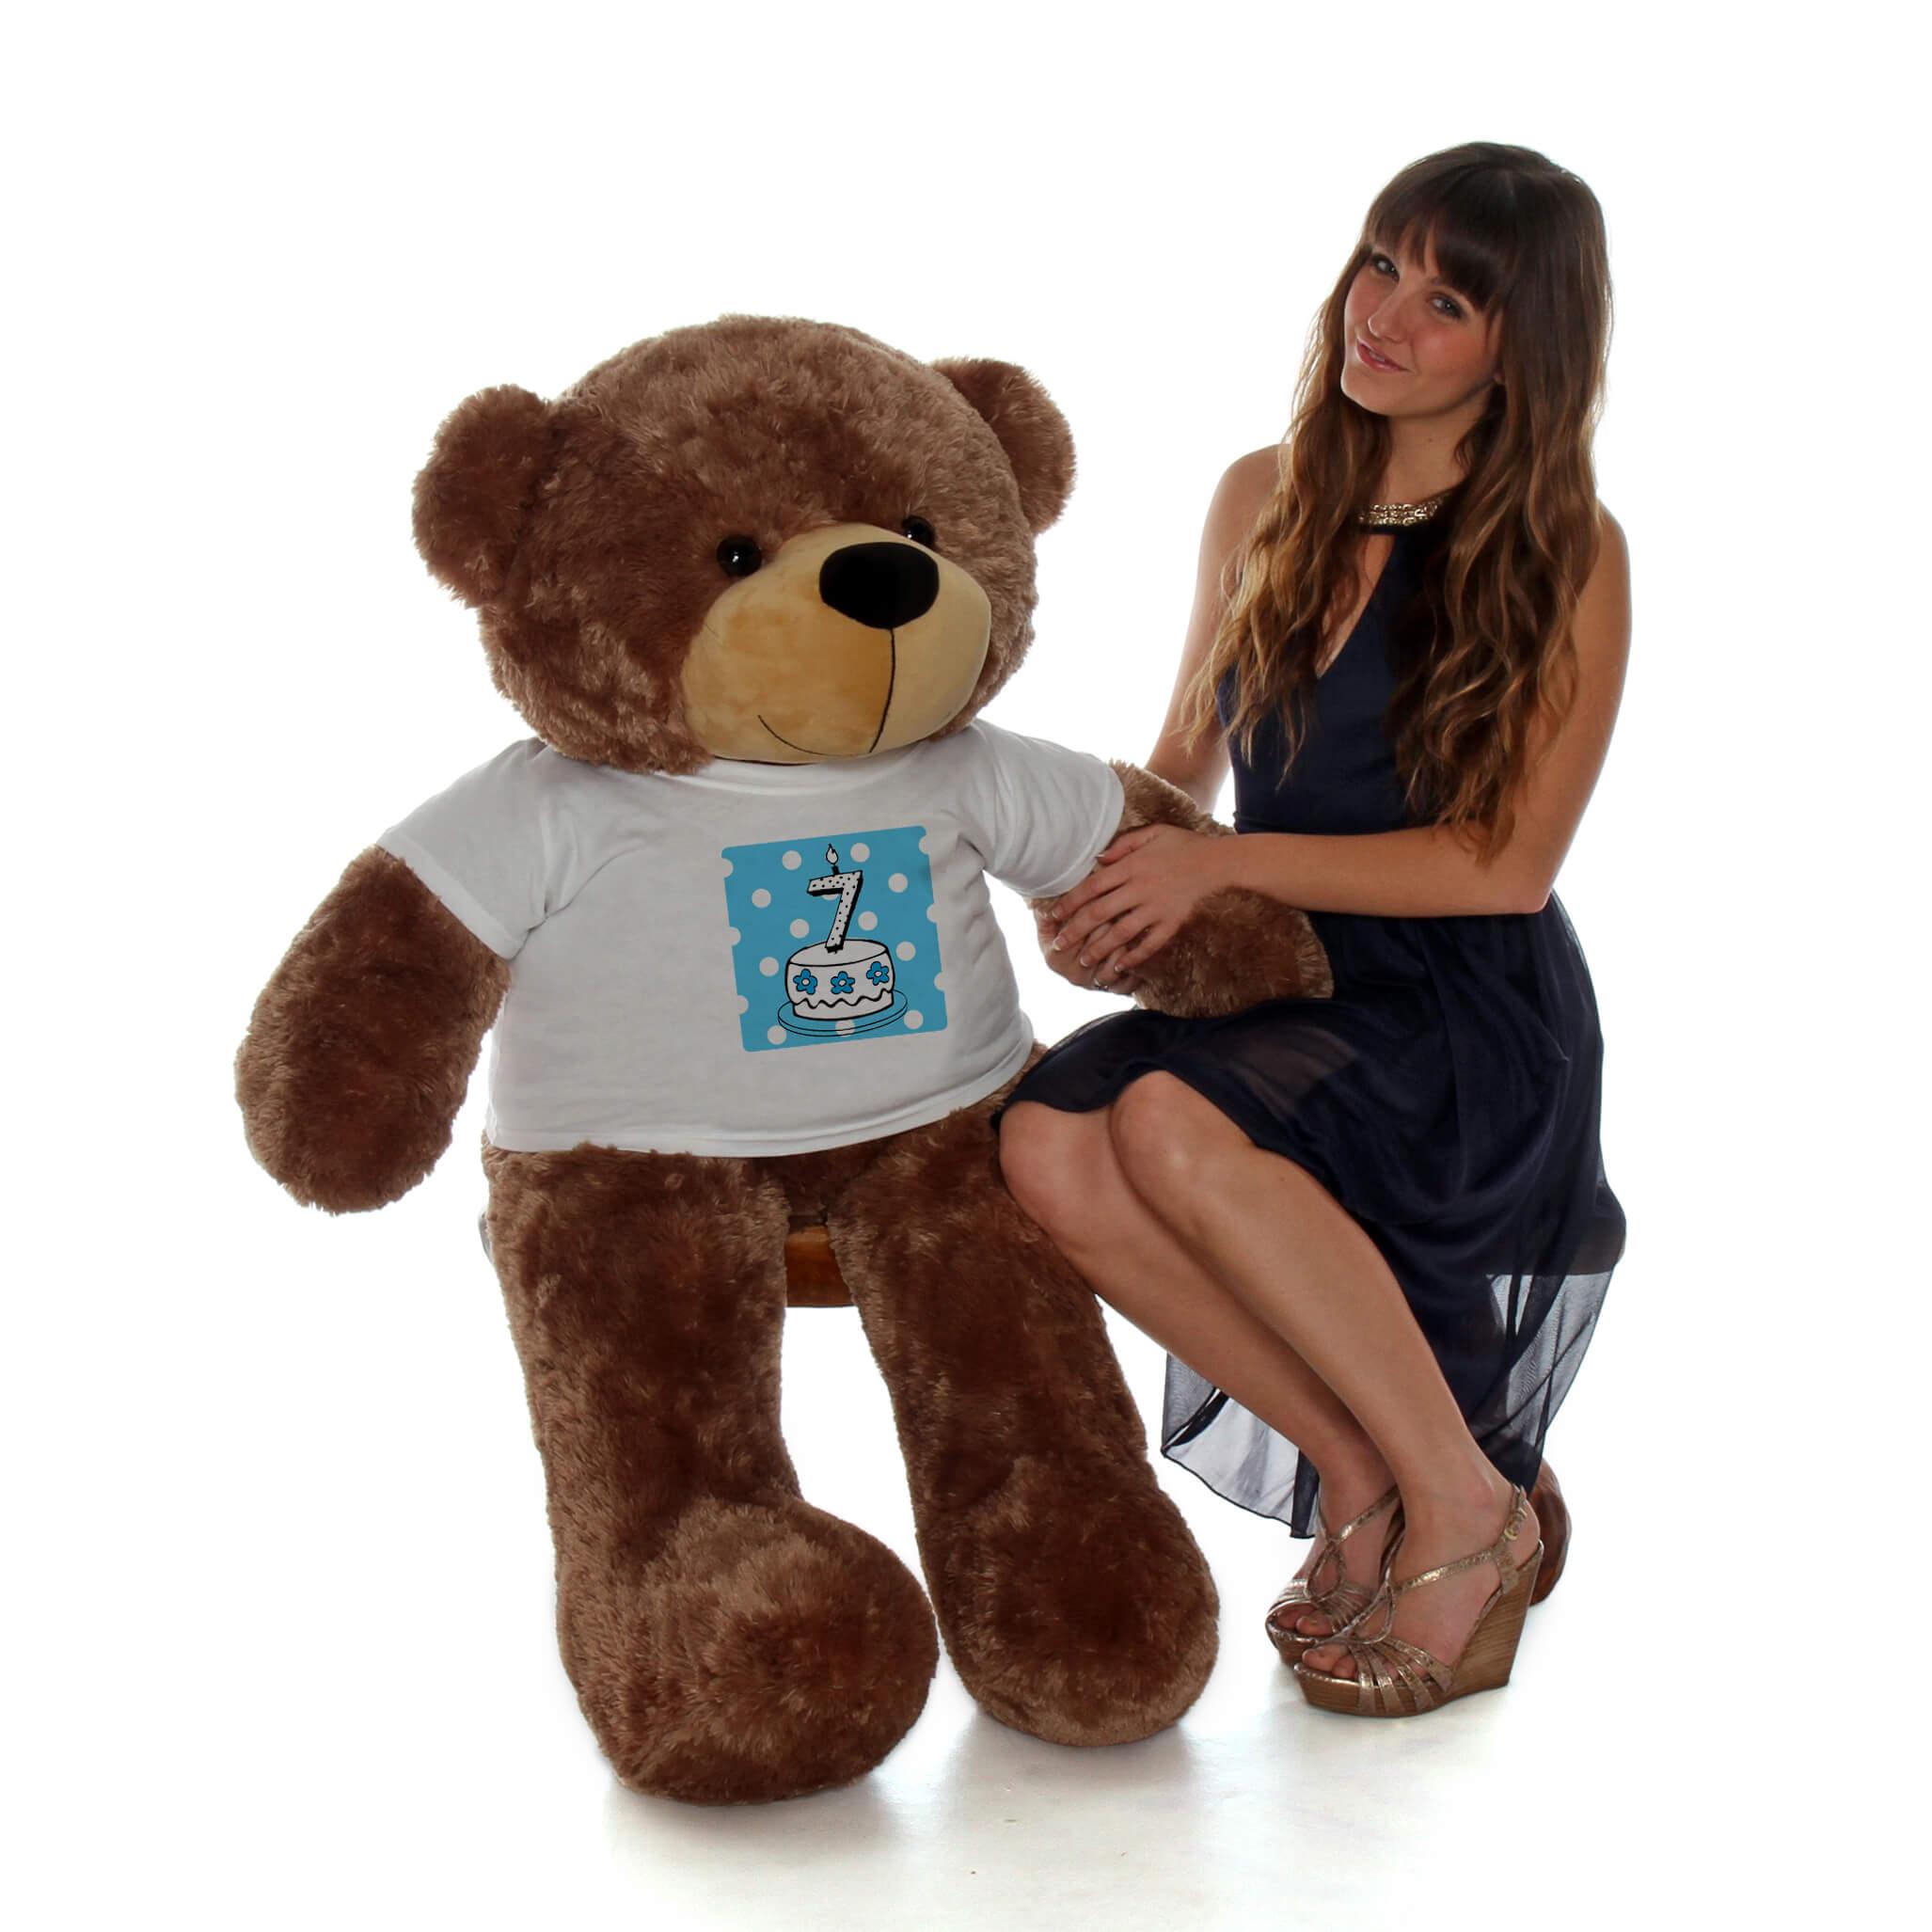 4ft-giant-teddy-sunny-cuddle-mocha-brown-bear-in-blue-birthday-cake-t-shirt.jpg